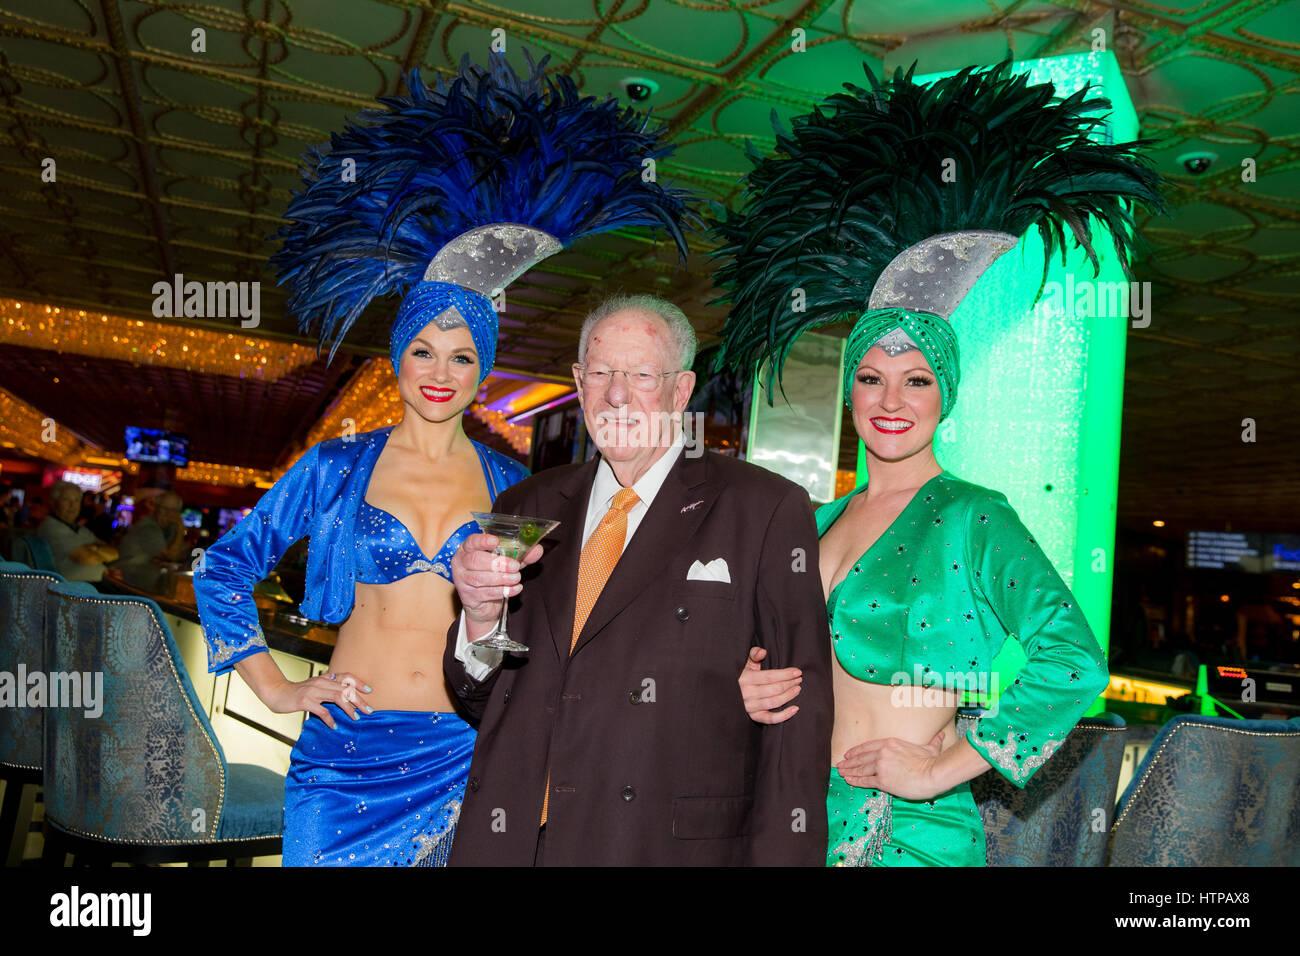 Las Vegas, NV, USA. 16th Mar, 2017. ***HOUSE COVERAGE*** Former Las Vegas Mayor and Host Committee Chairman Oscar - Stock Image